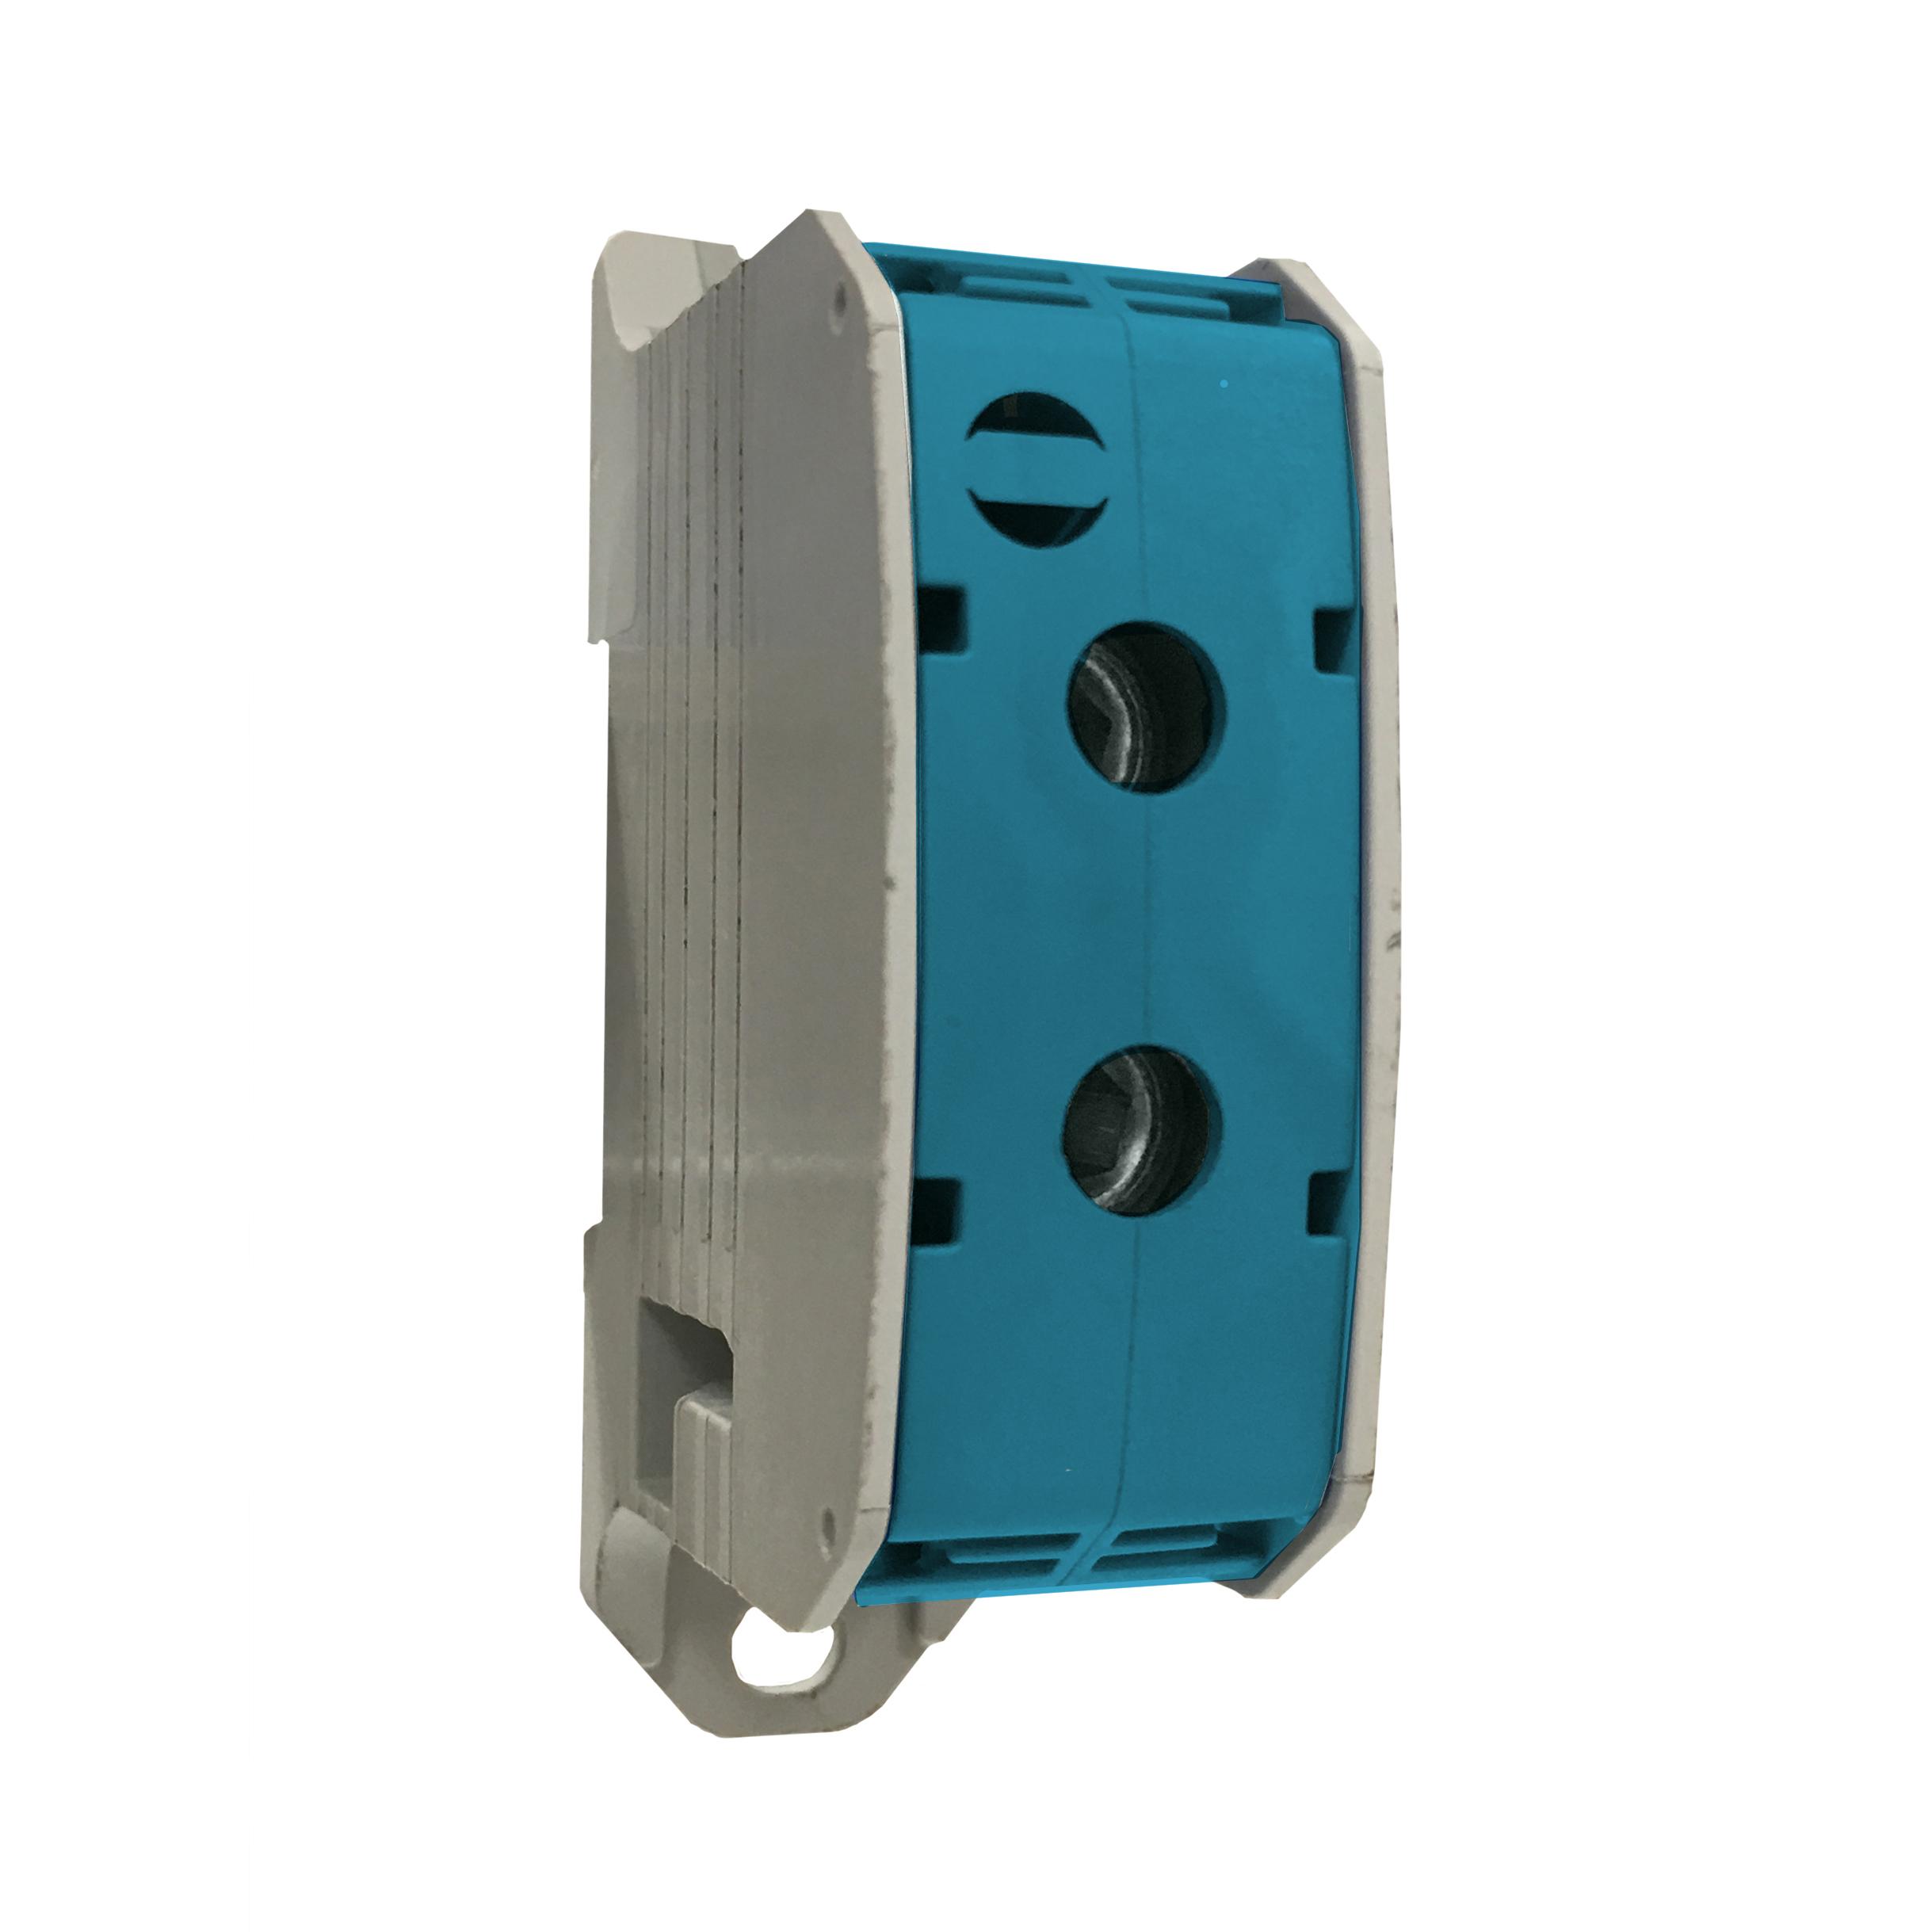 1 Stk Aluminium /Kupfer Klemme, 1-polig, 300mm² blau IKA21720--